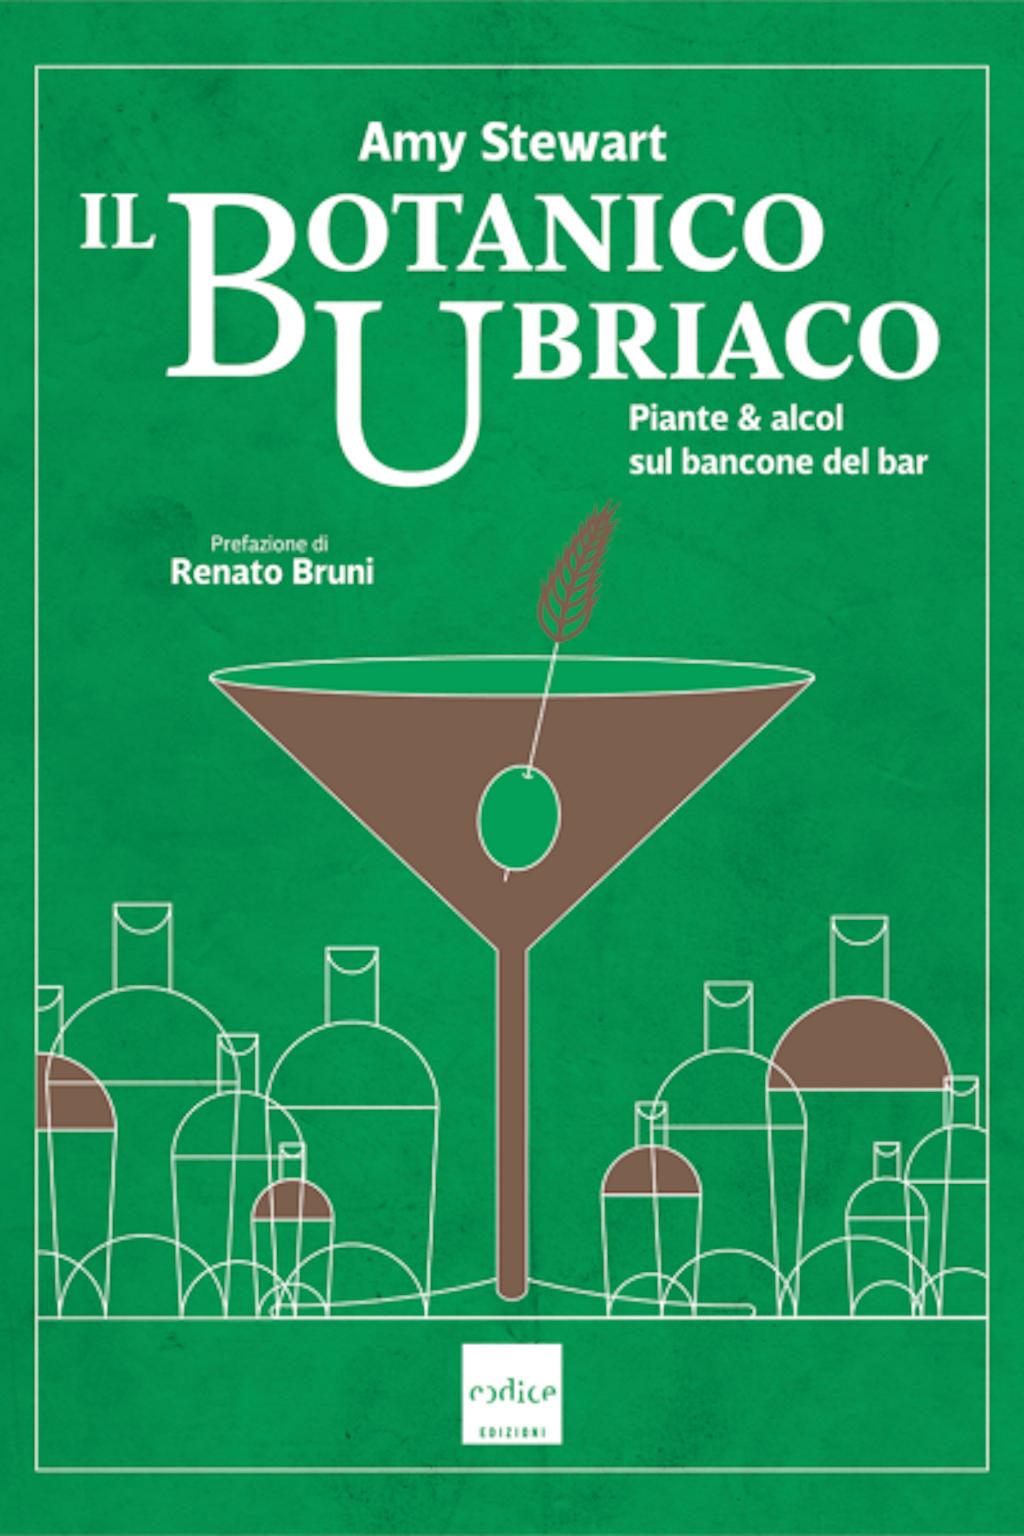 Il botanico ubriaco